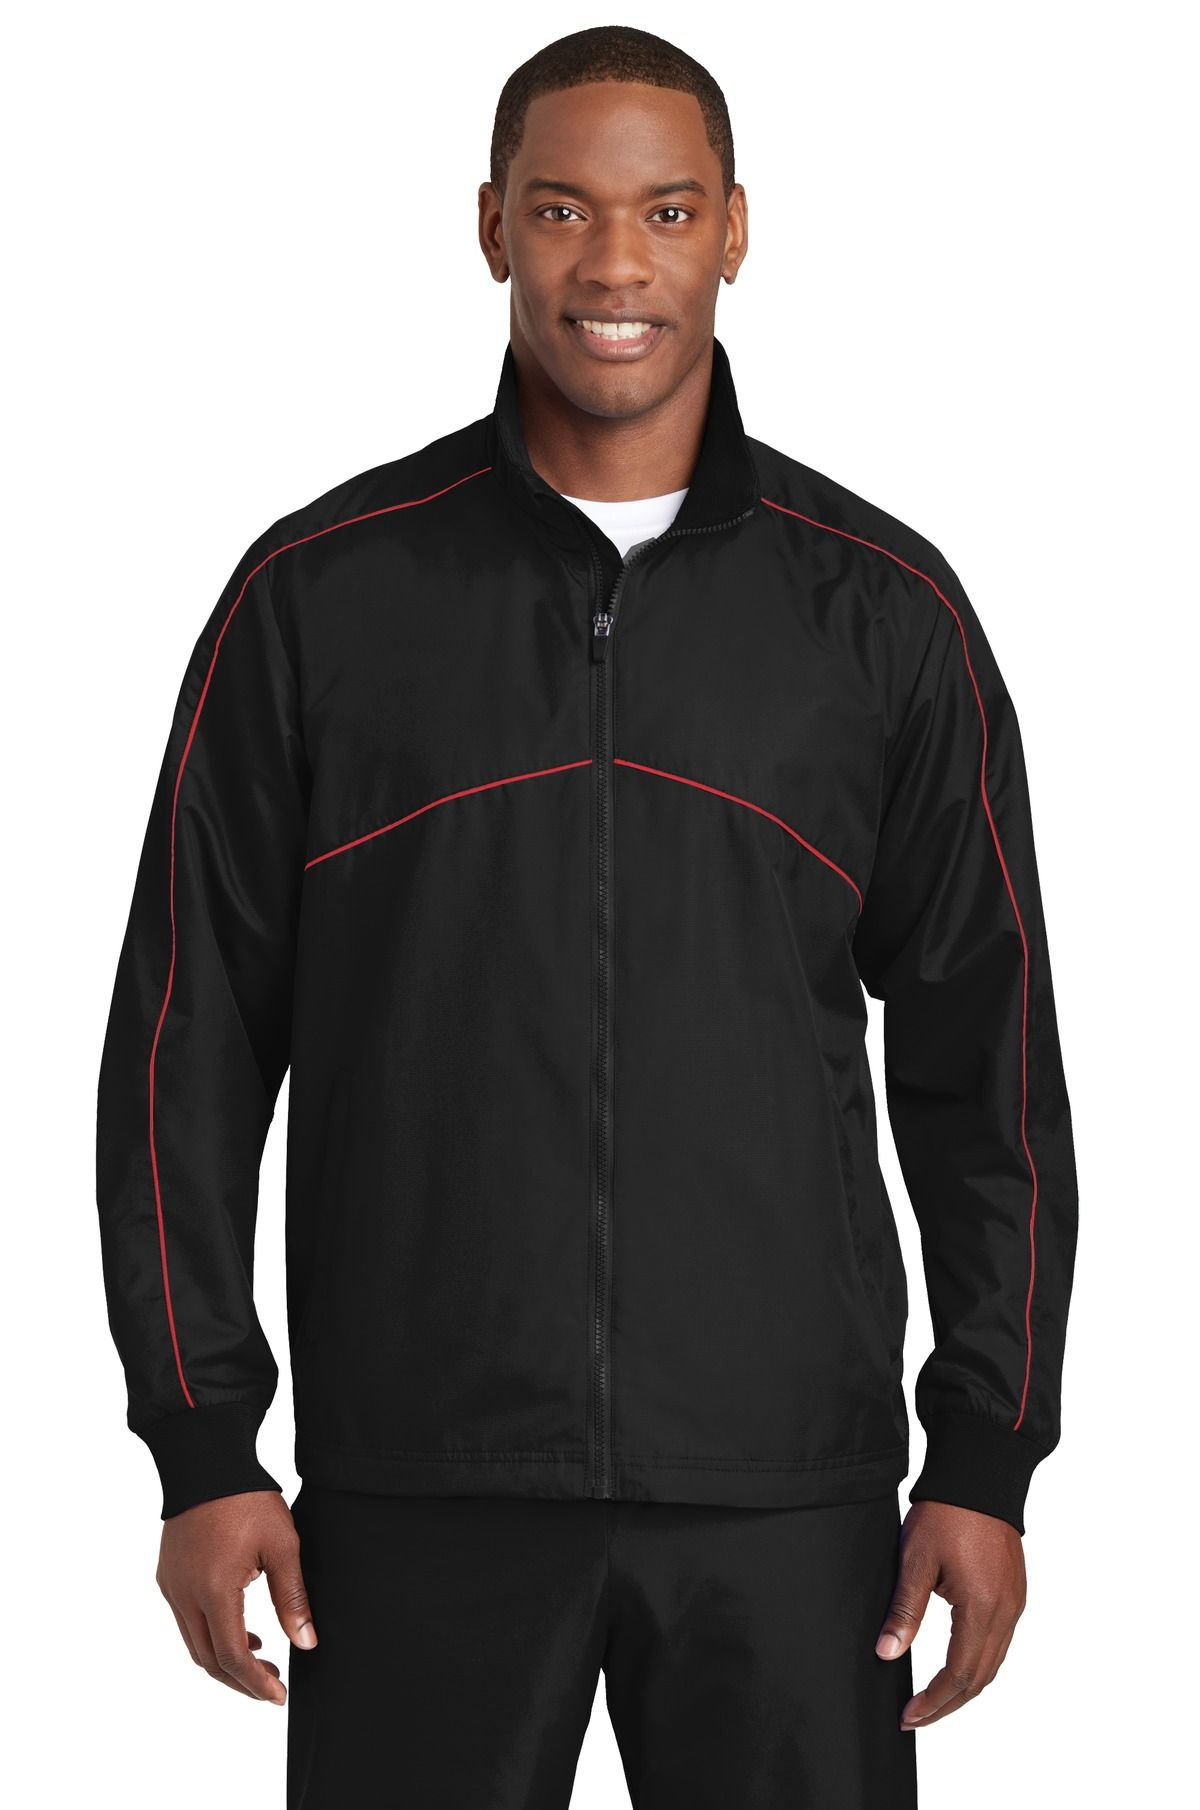 SportTek JST83 Shield Ripstop Jacket Wind resistant